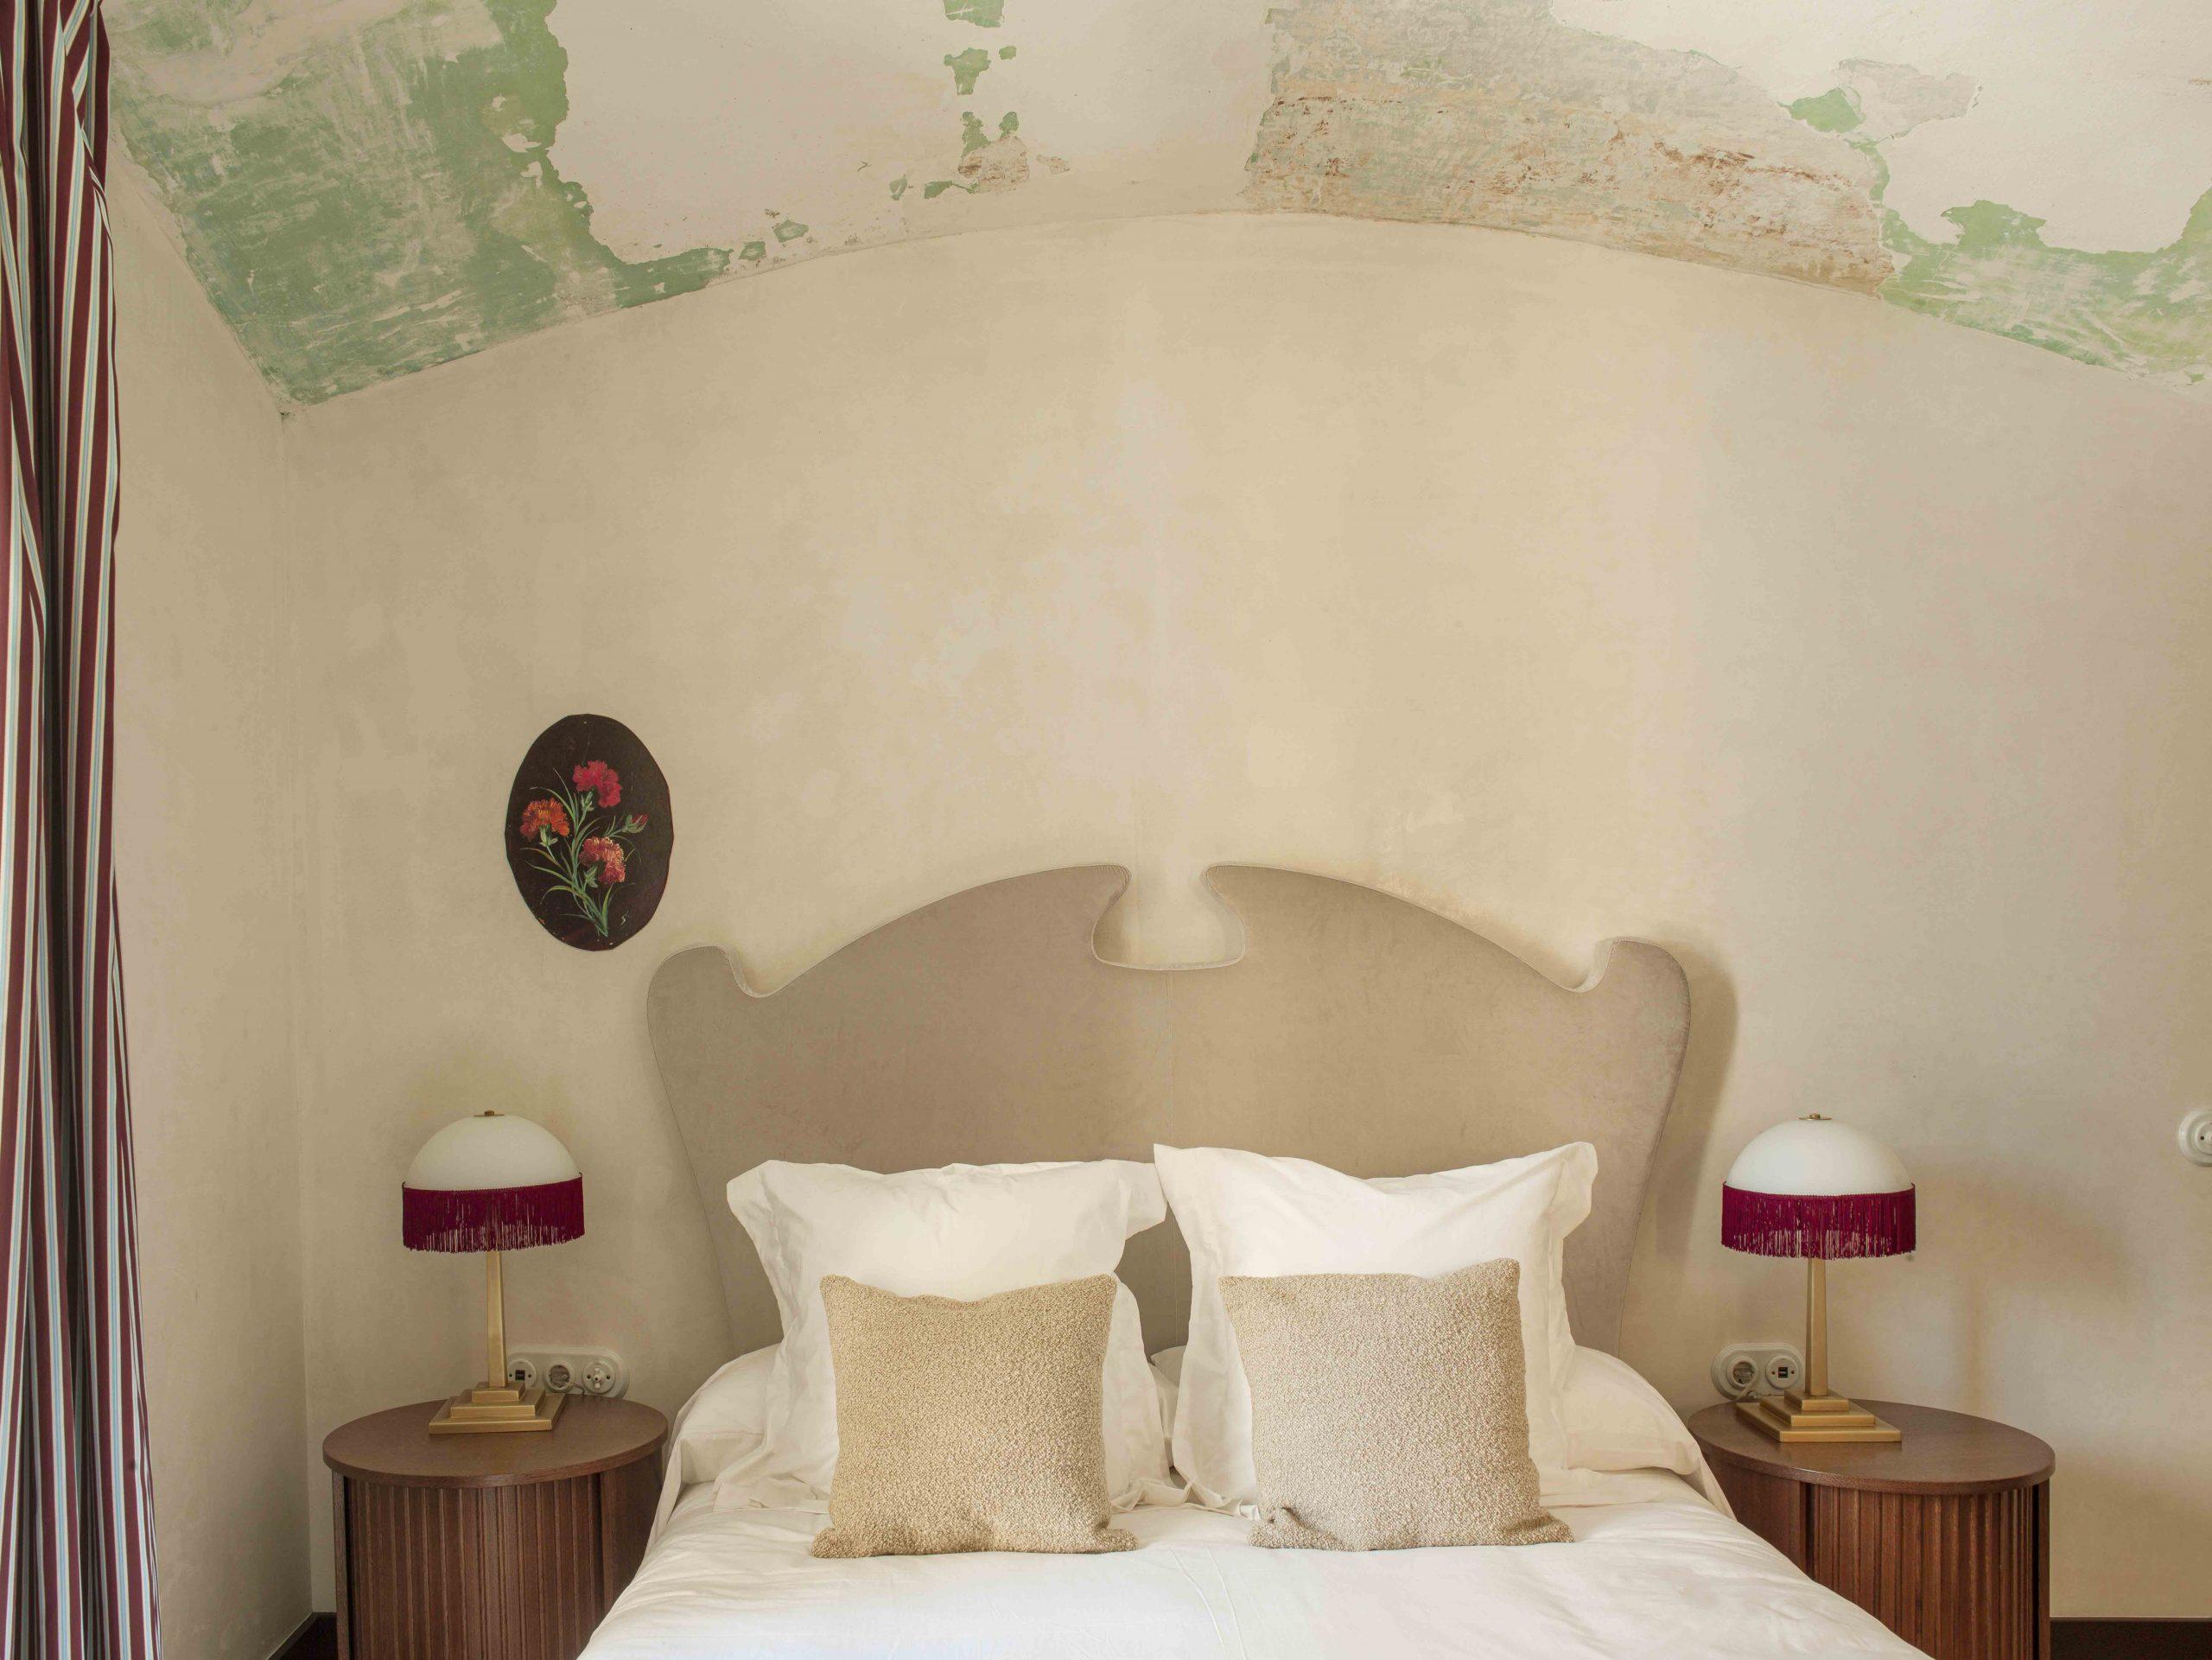 Hotel La Bionda